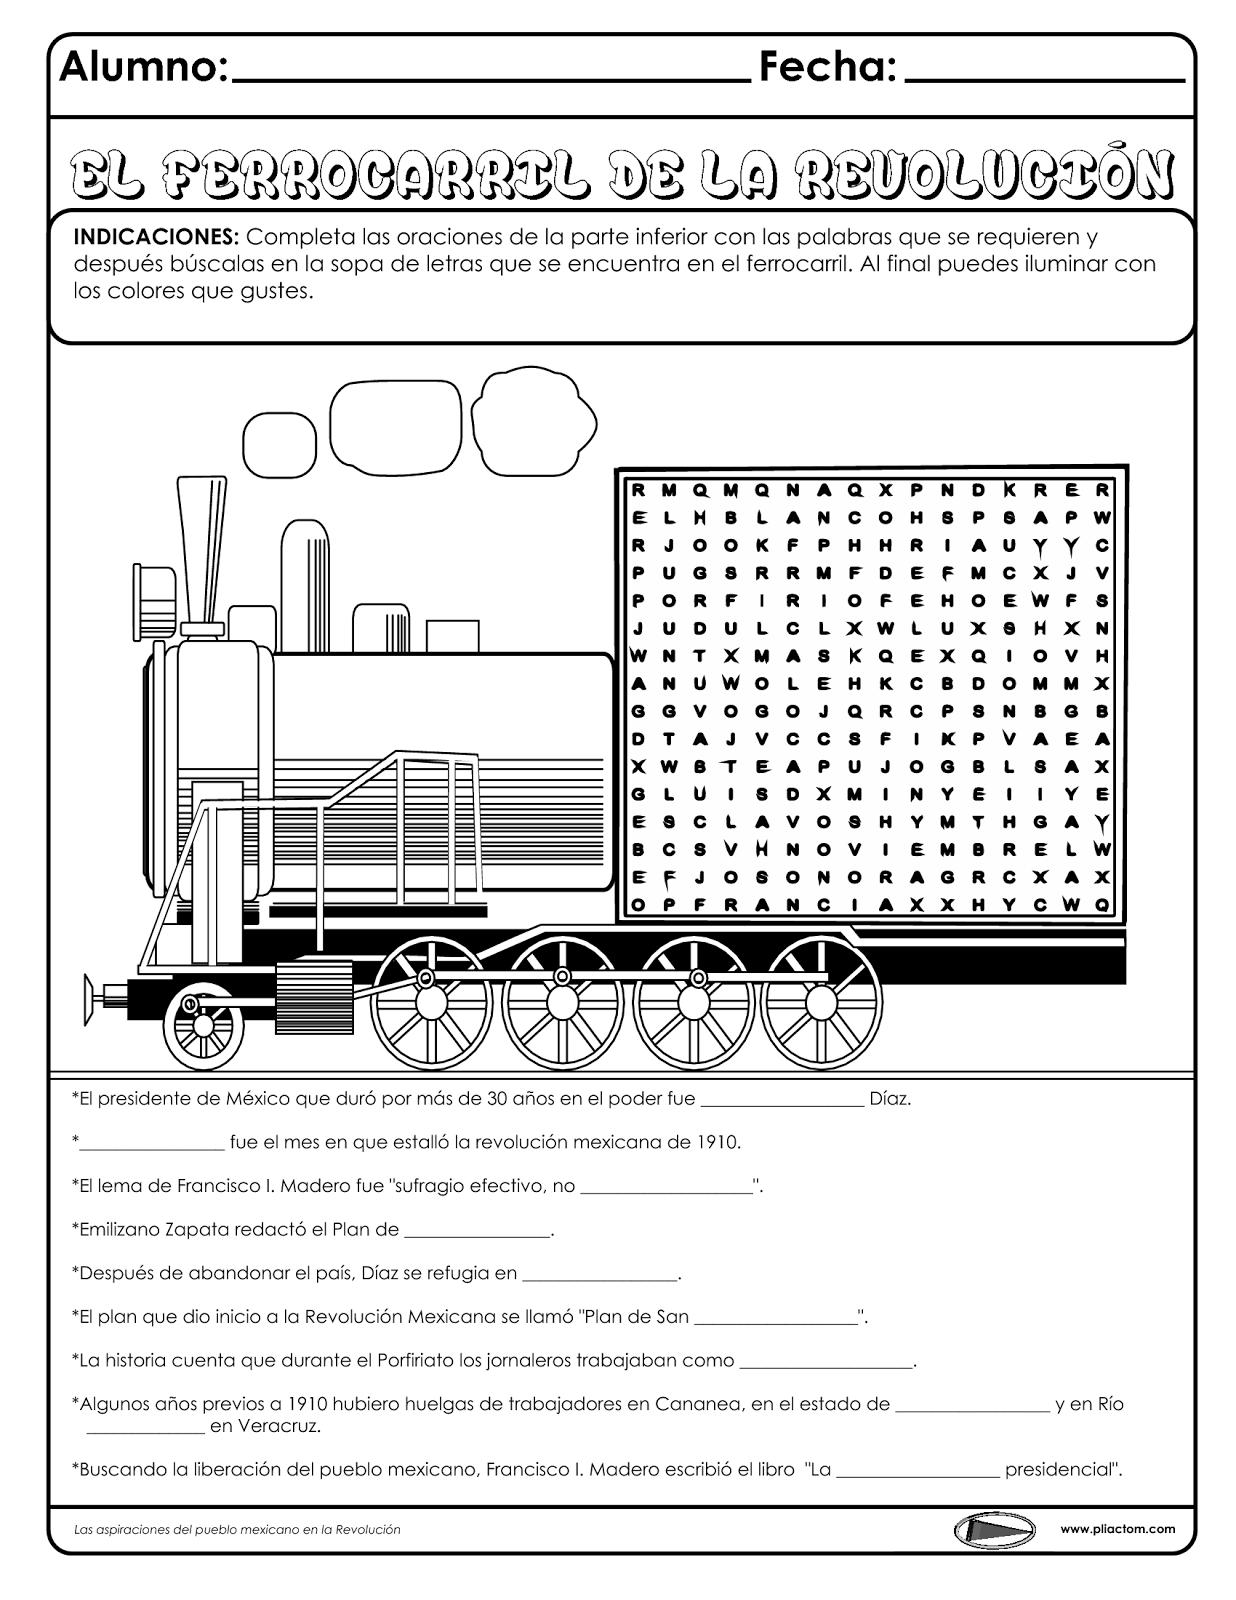 El Ferrocarril De La Revolución Mexicana